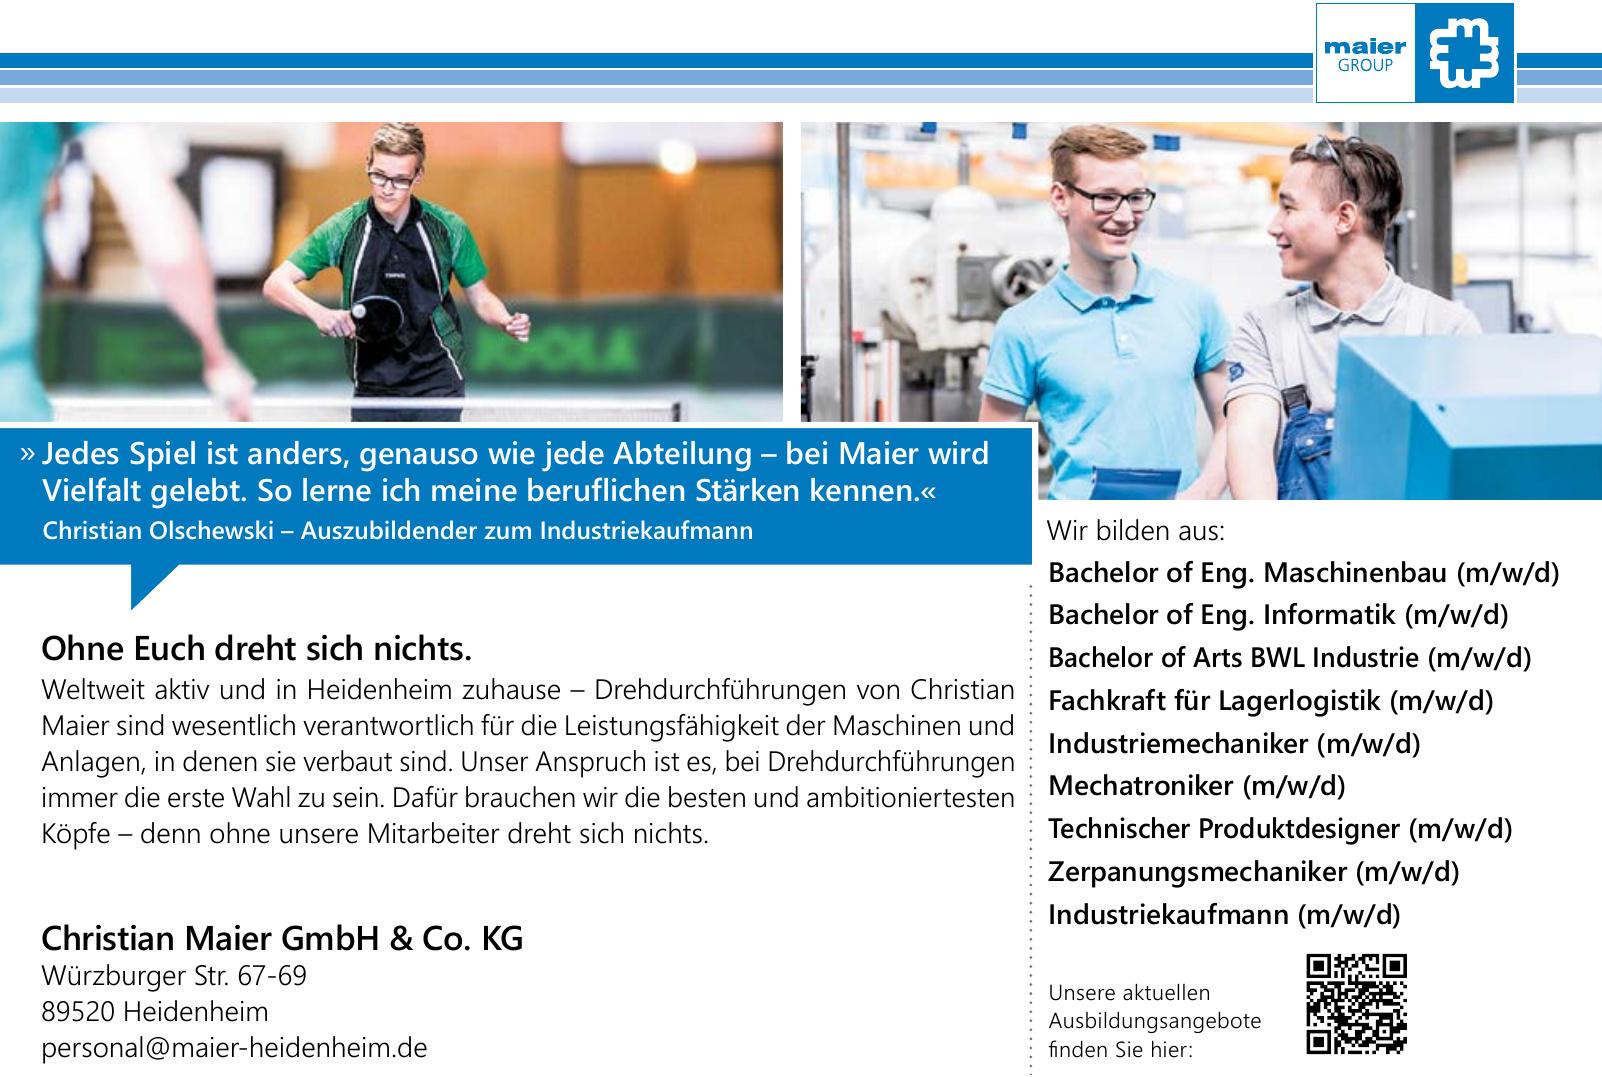 Christian Maier GmbH & Co. KG